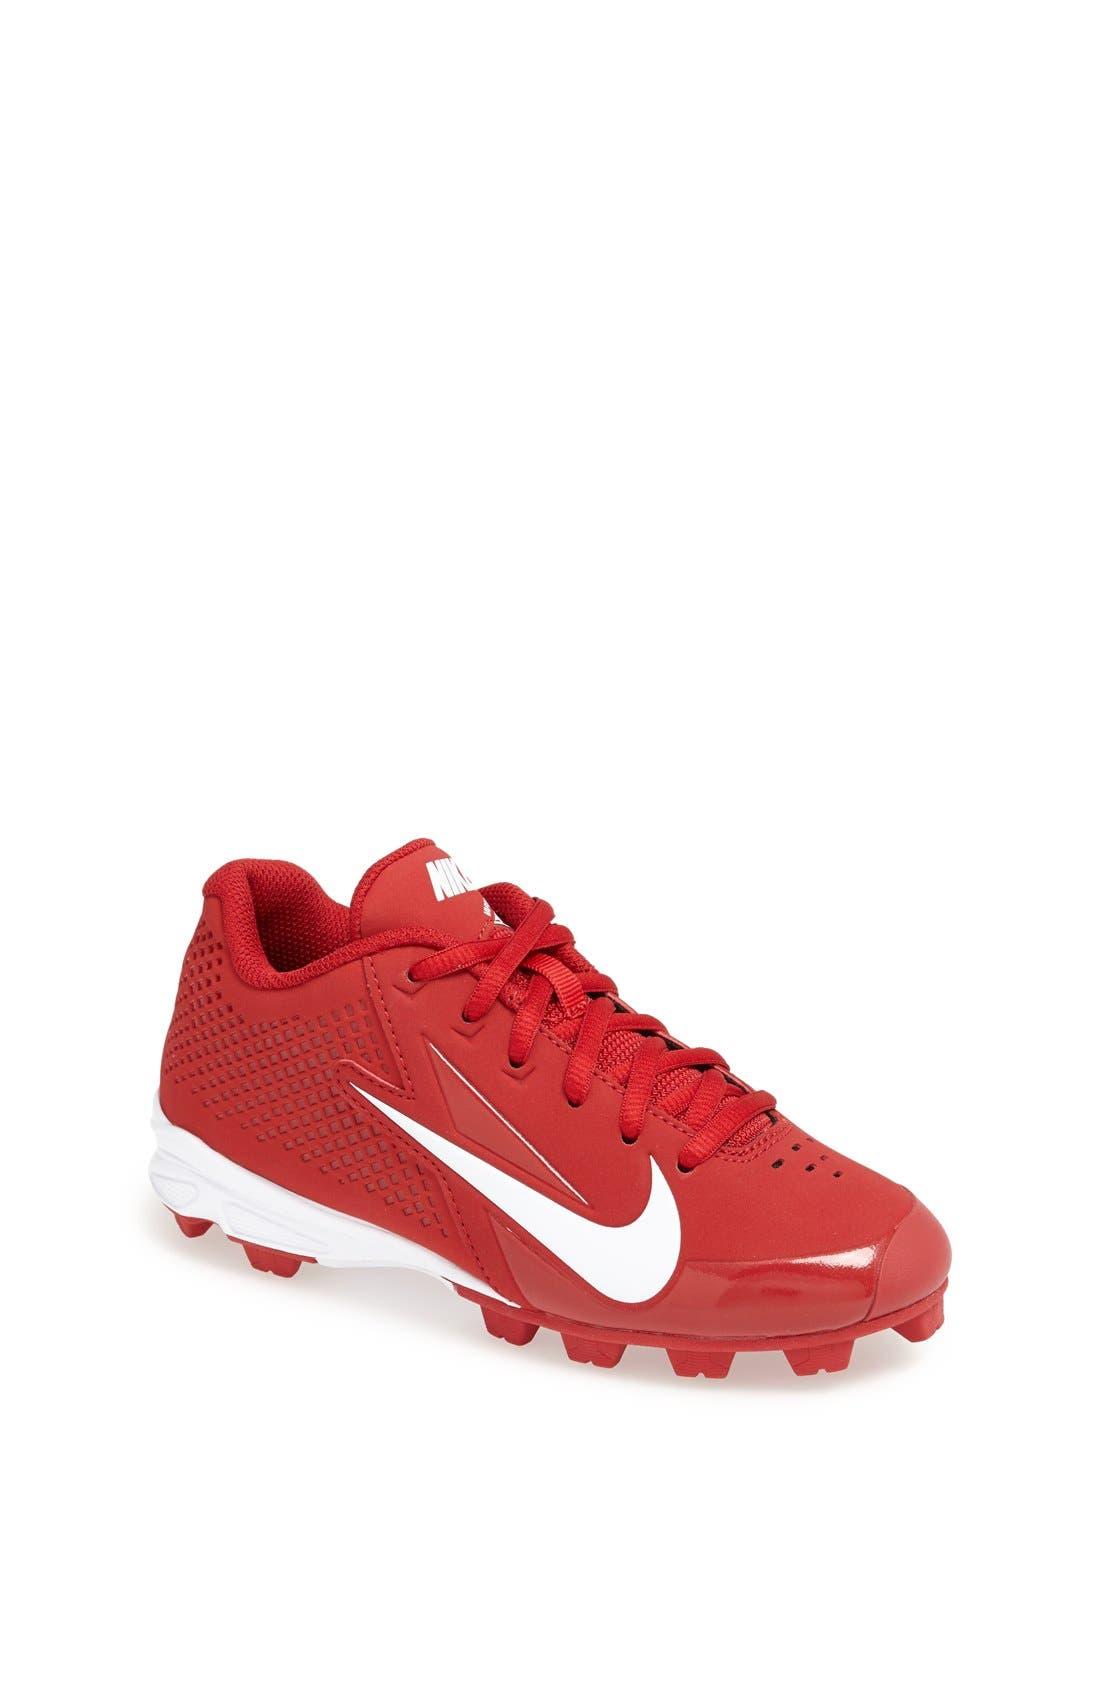 Main Image - Nike \u0027Vapor Keystone Low\u0027 Baseball Cleat (Little Kid \u0026 Big